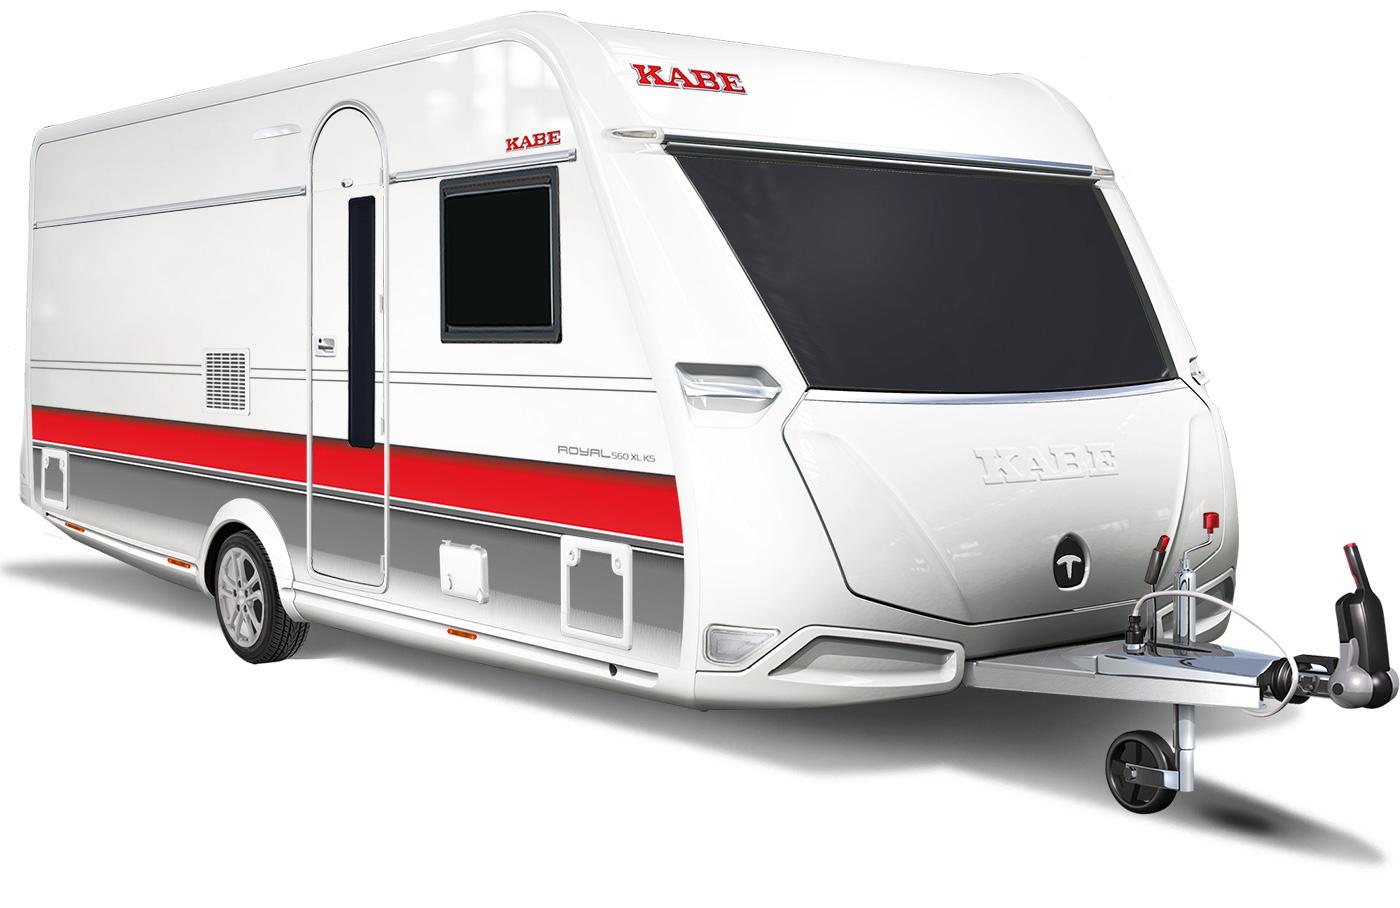 Kabe - Royal 560 XL